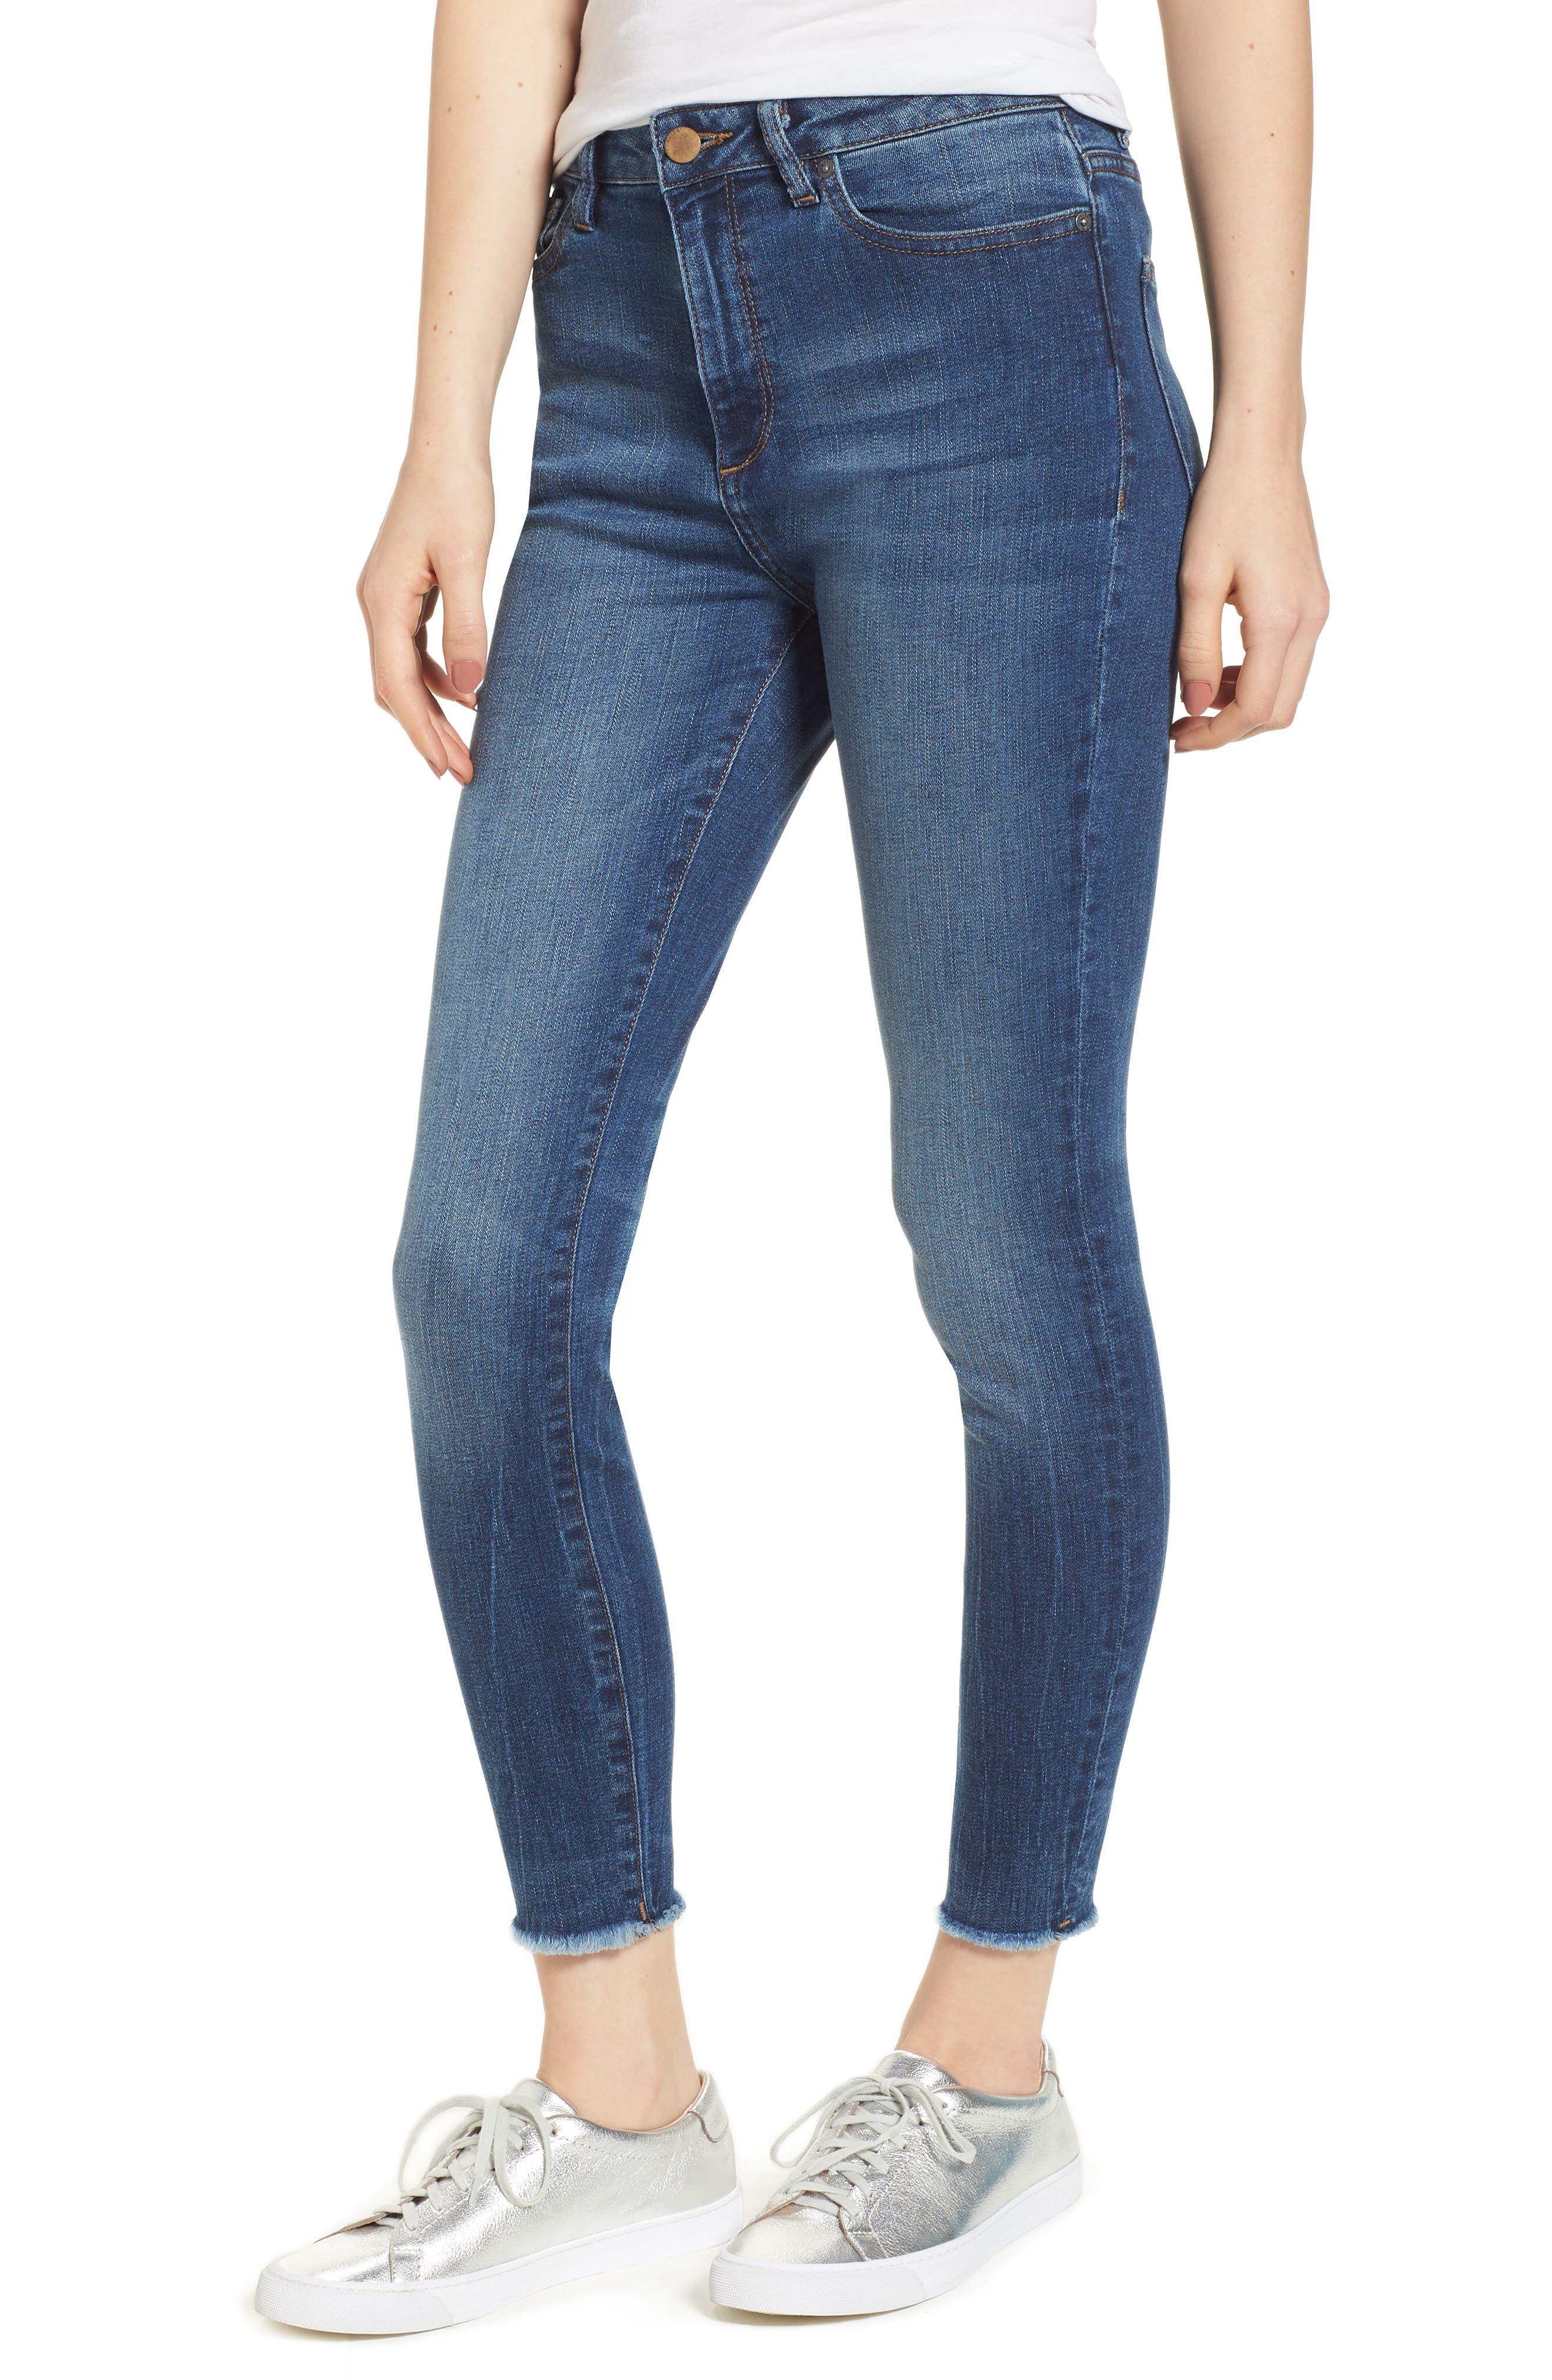 Chrissy Trimtone High Waist Skinny Jeans,                             Main thumbnail 1, color,                             Bal Harbour